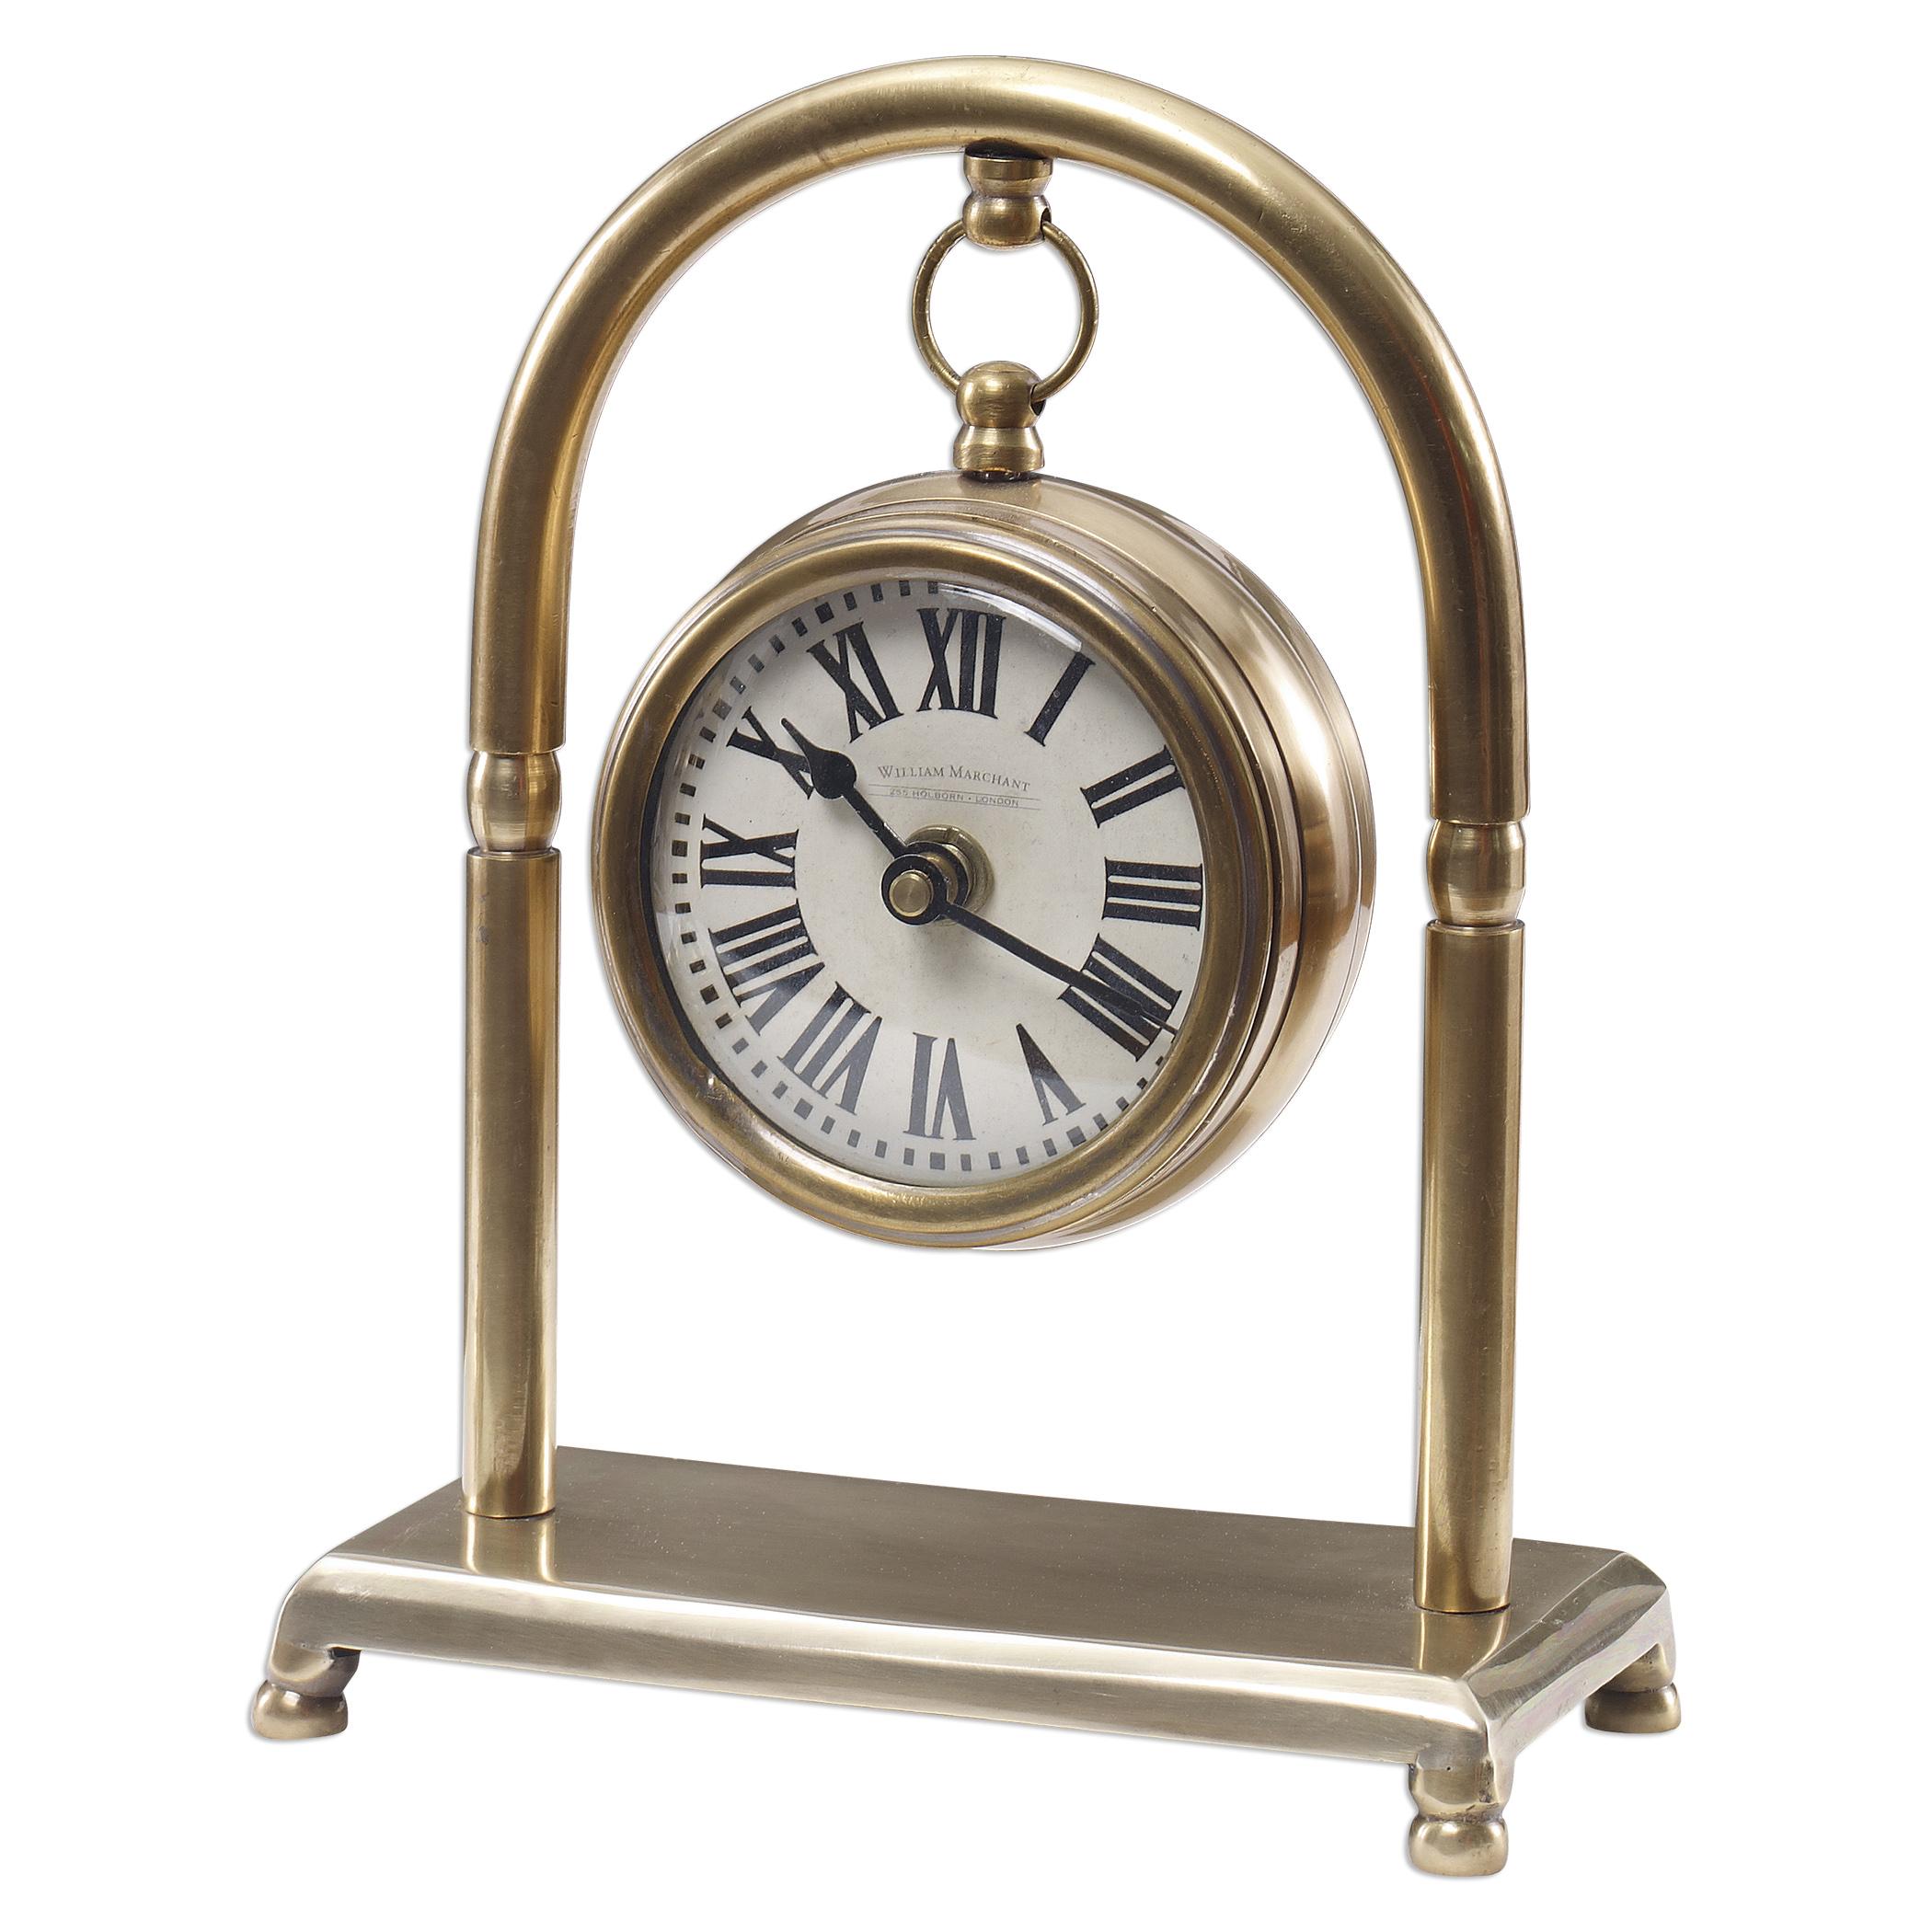 Uttermost Clocks Bahan Brass Table Clock - Item Number: 06431